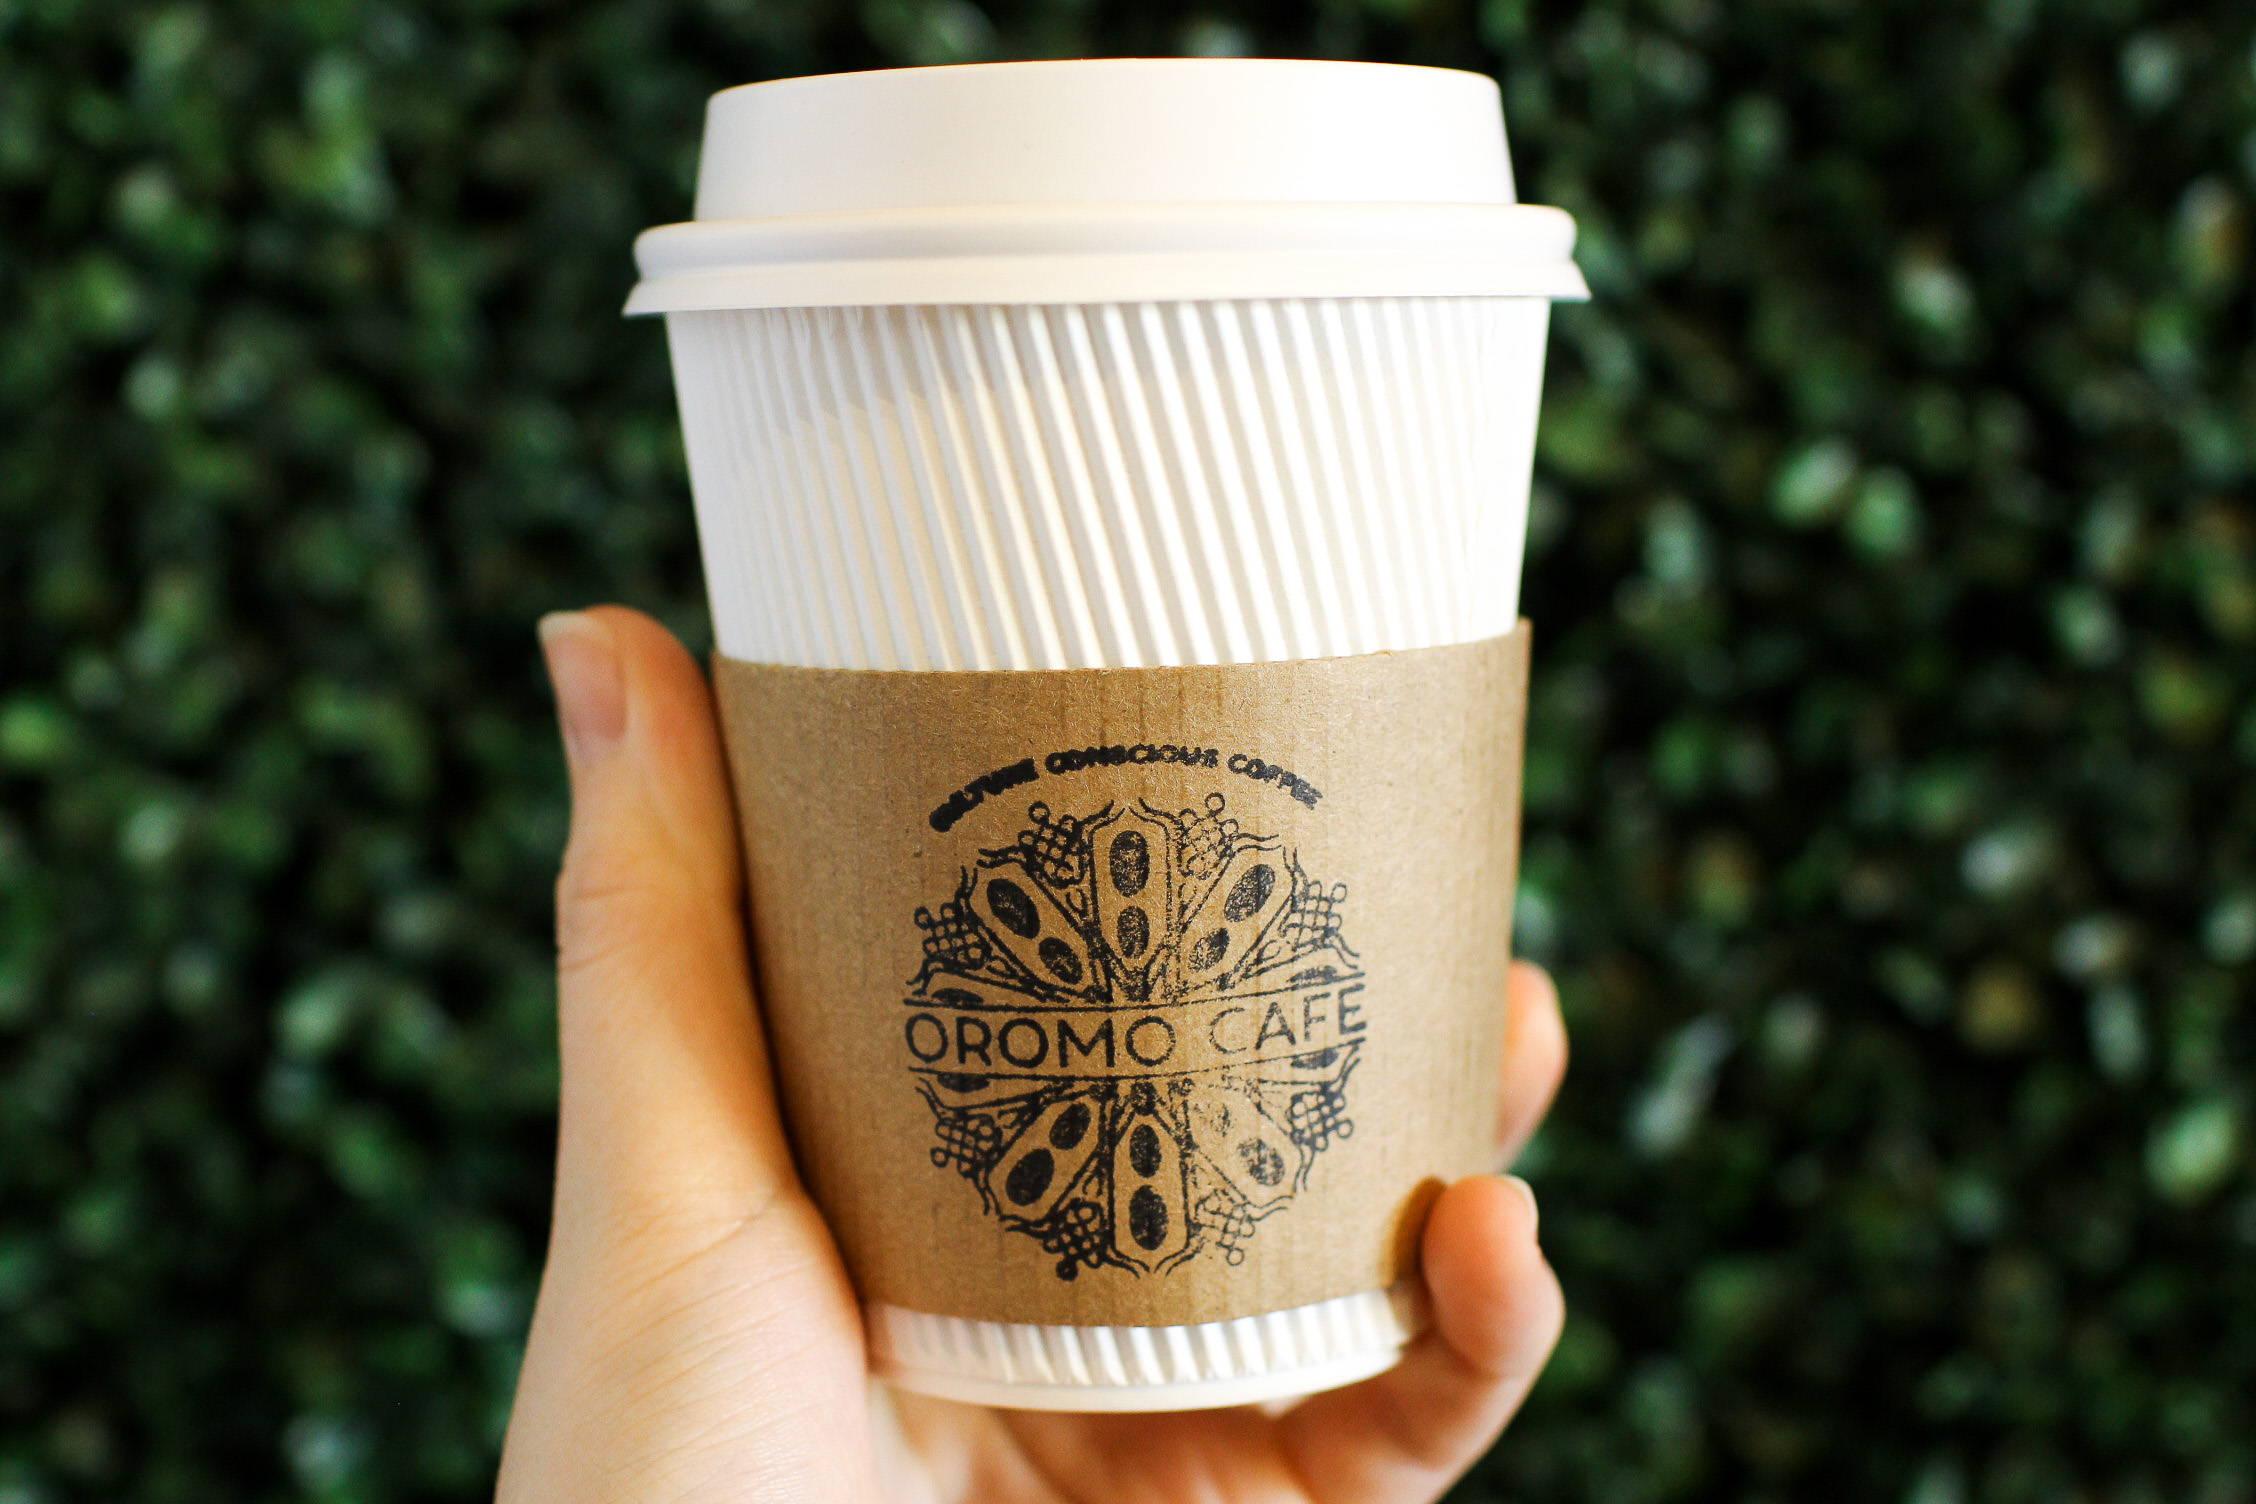 Oromo Coffee - 420 Coffee Pairings at DopeBoo.com